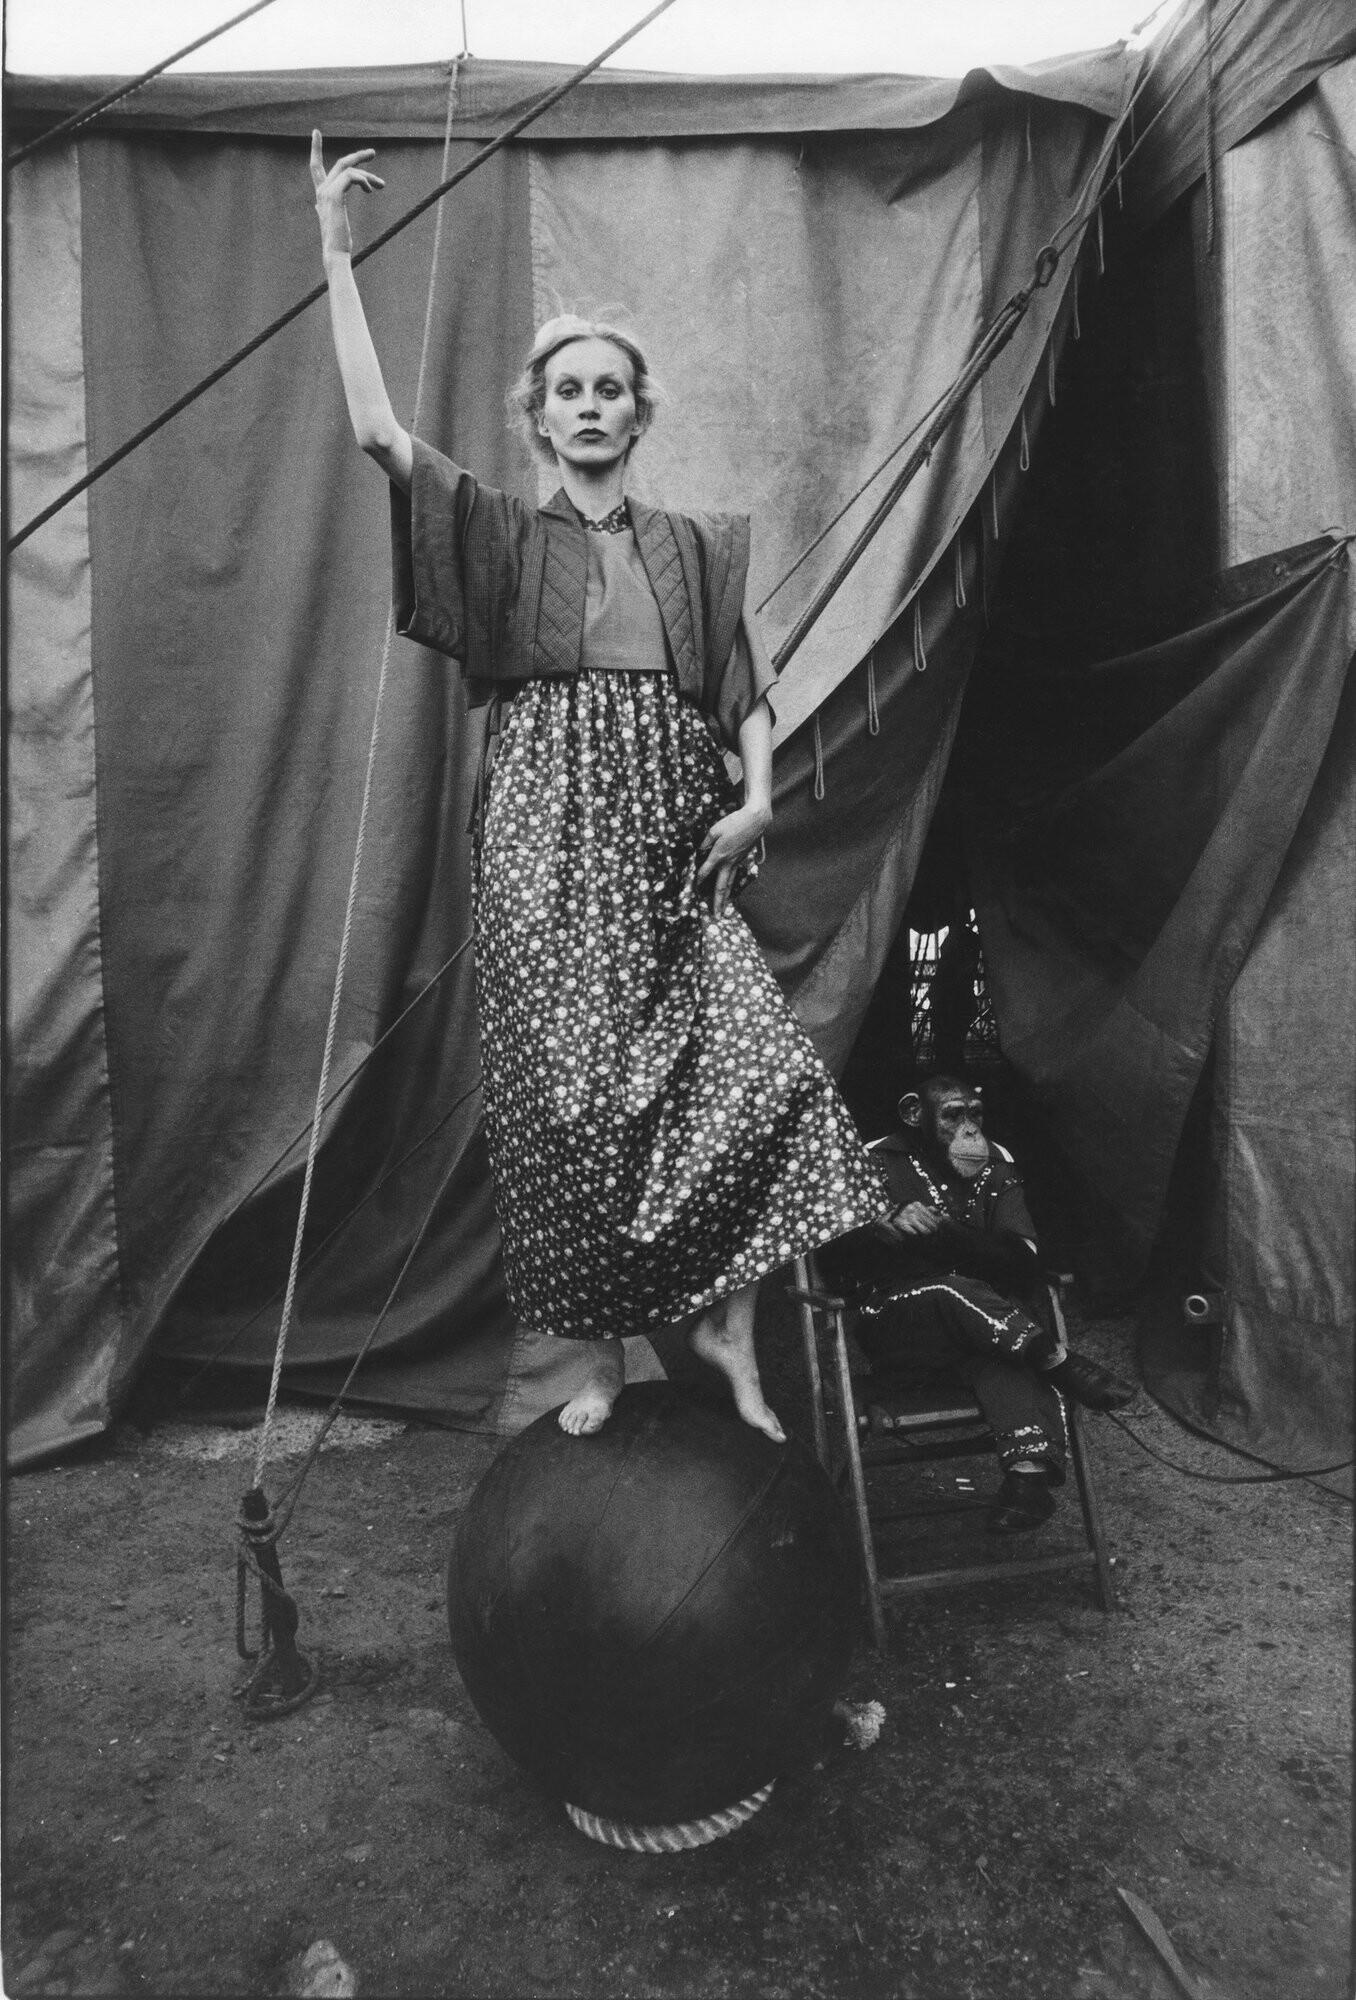 Сьюзи, из серии Мода ГДР, 1976 год. Фотограф Сибилла Бергеман